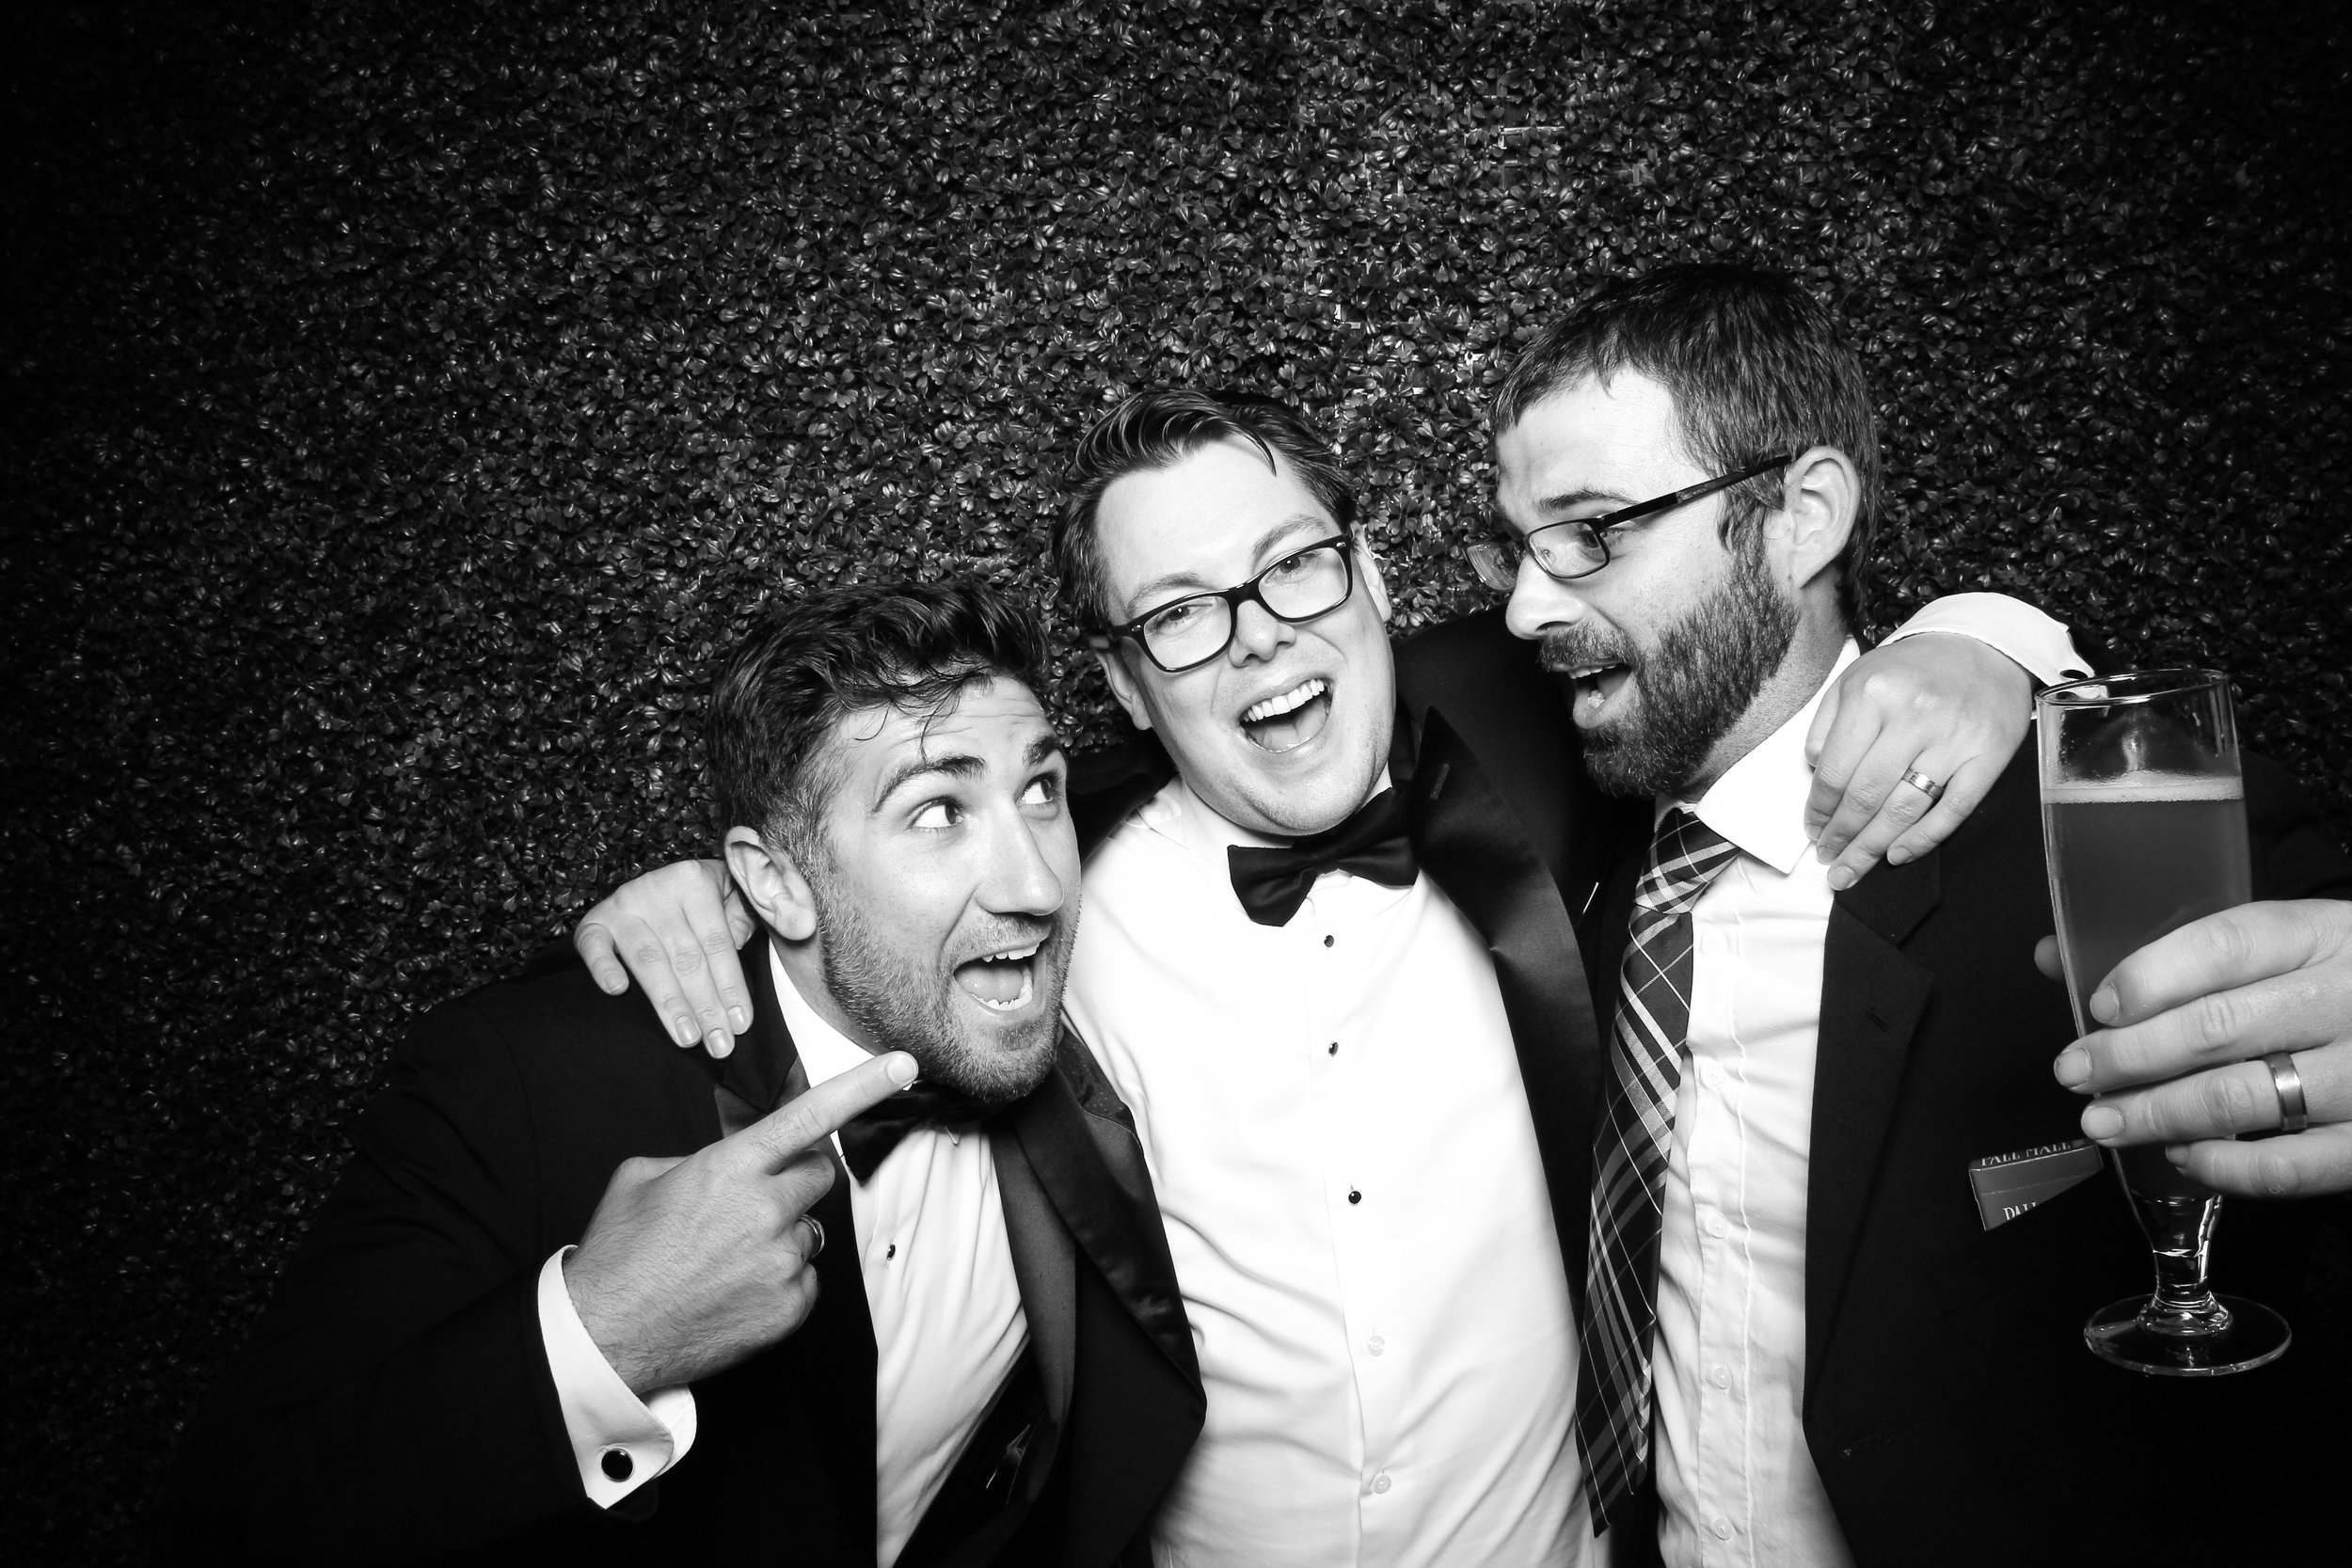 Ivy_Room_Chicago_Wedding_Reception_Photo_Booth_Rental__13.jpg